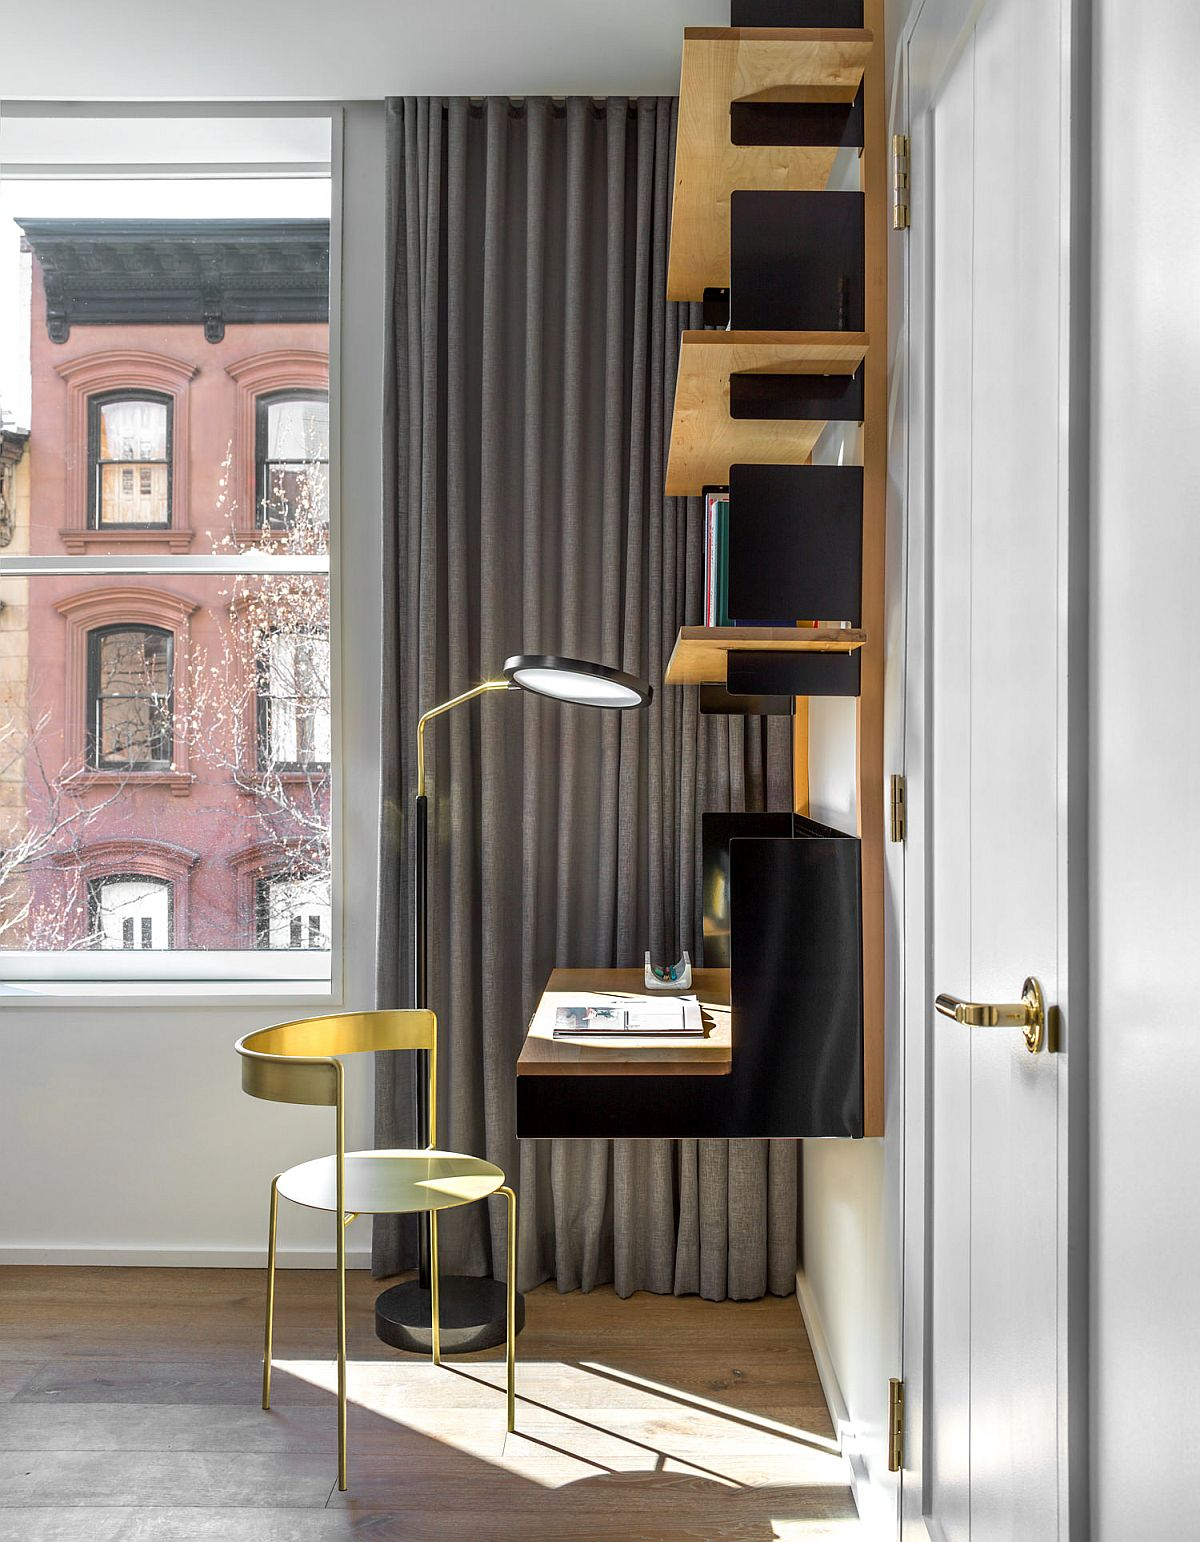 Wall-mouned-shelf-and-brass-combine-to-create-a-fabulous-corner-workspace-26372